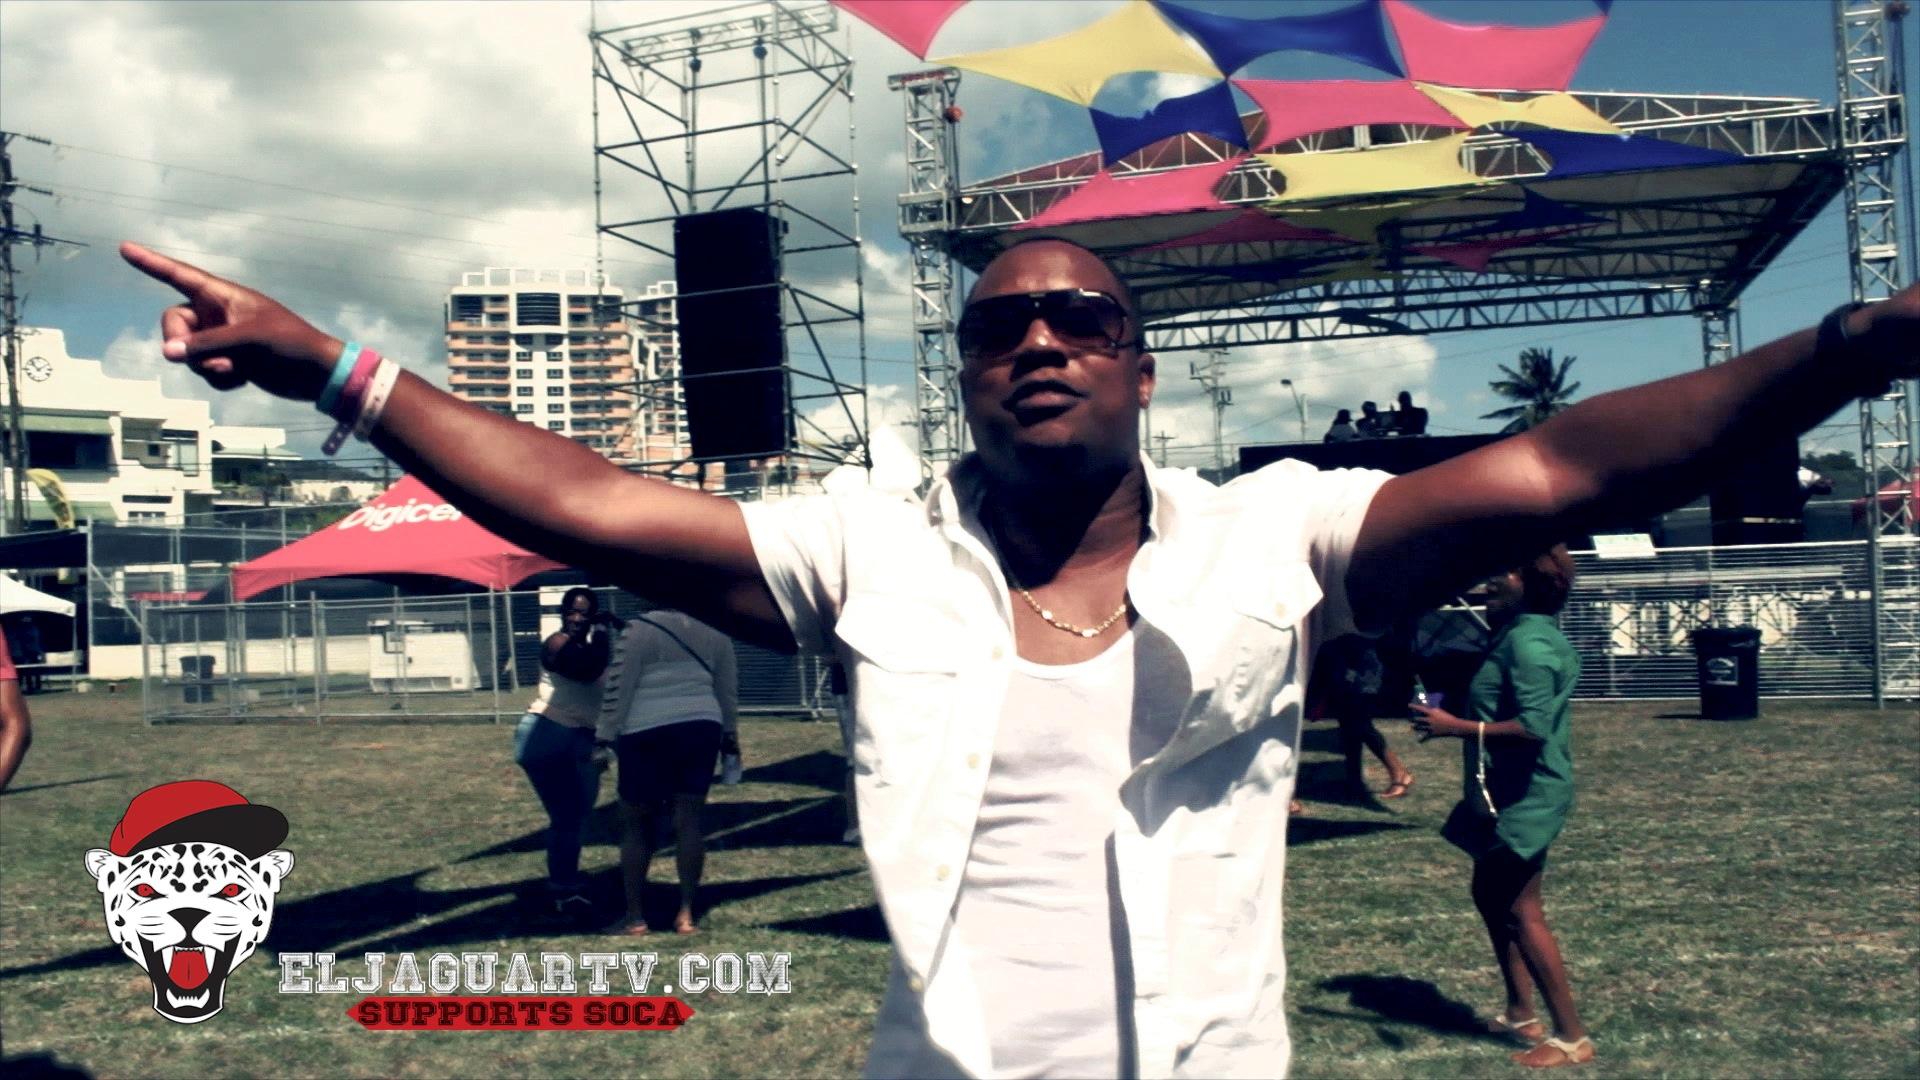 Trinidad Carnival 2015 ep 2 photo28.jpg